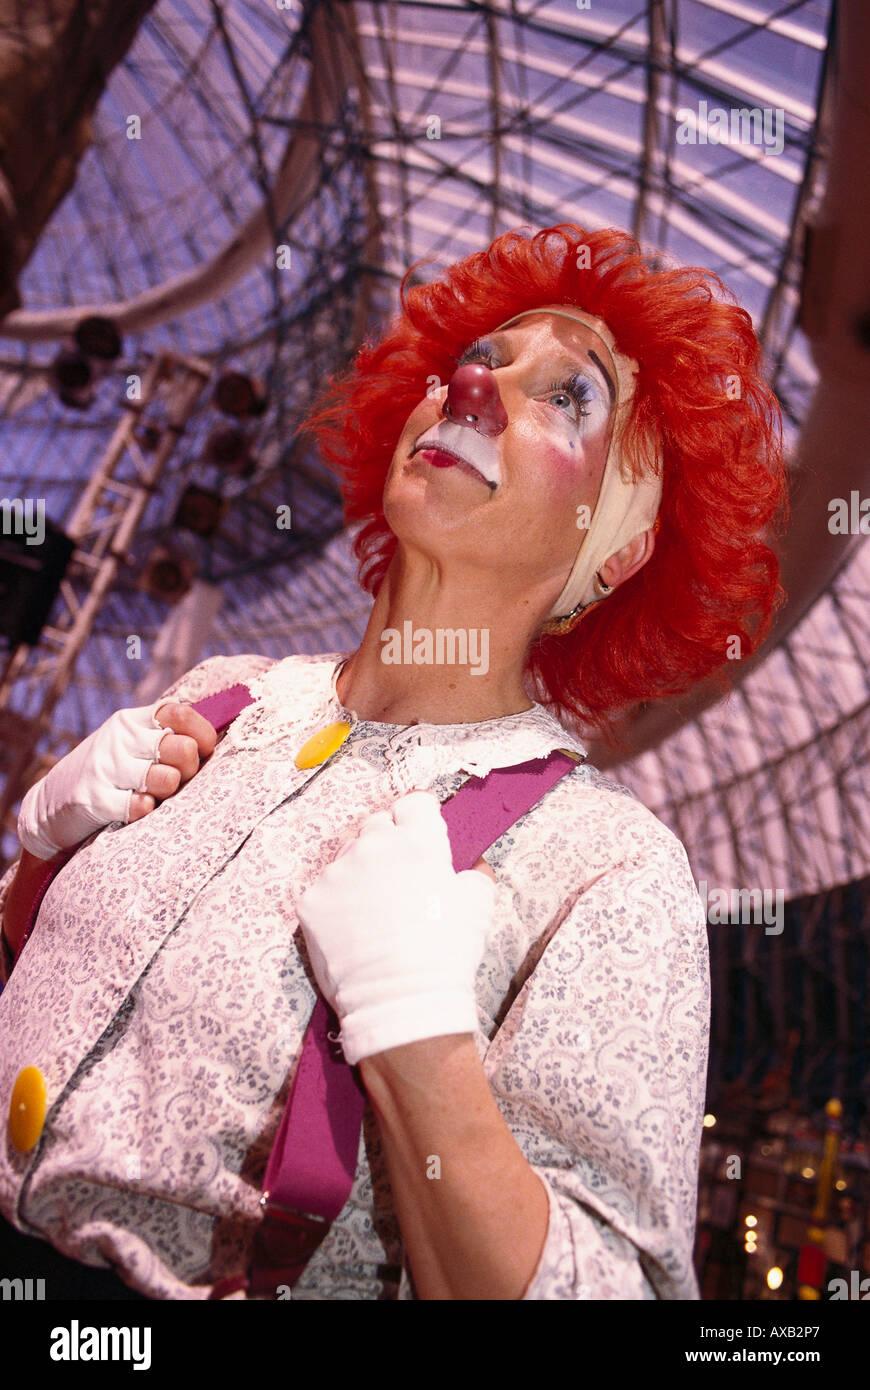 clown at adventuredome circus circus las vegas nevada usa stock image - Adventuredome Halloween